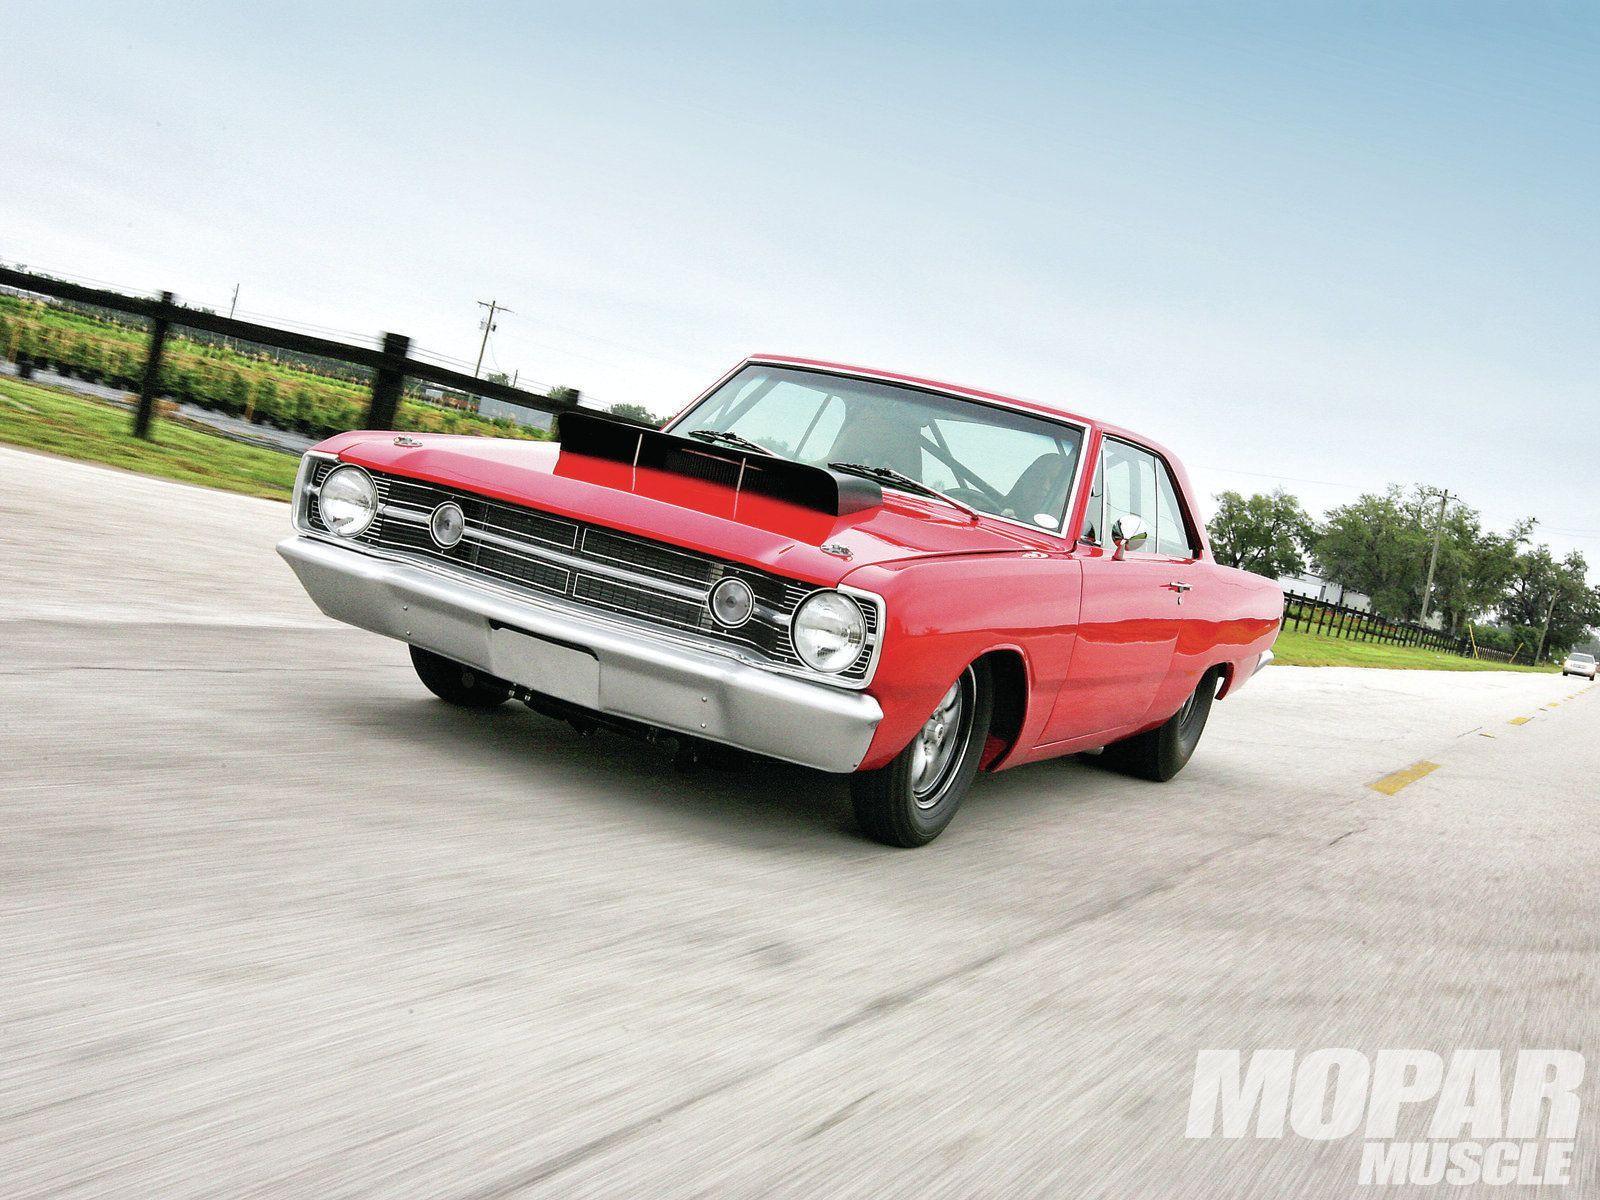 1969 Dodge Dart | Cars and motorcycles | Pinterest | Darts, Mopar ...